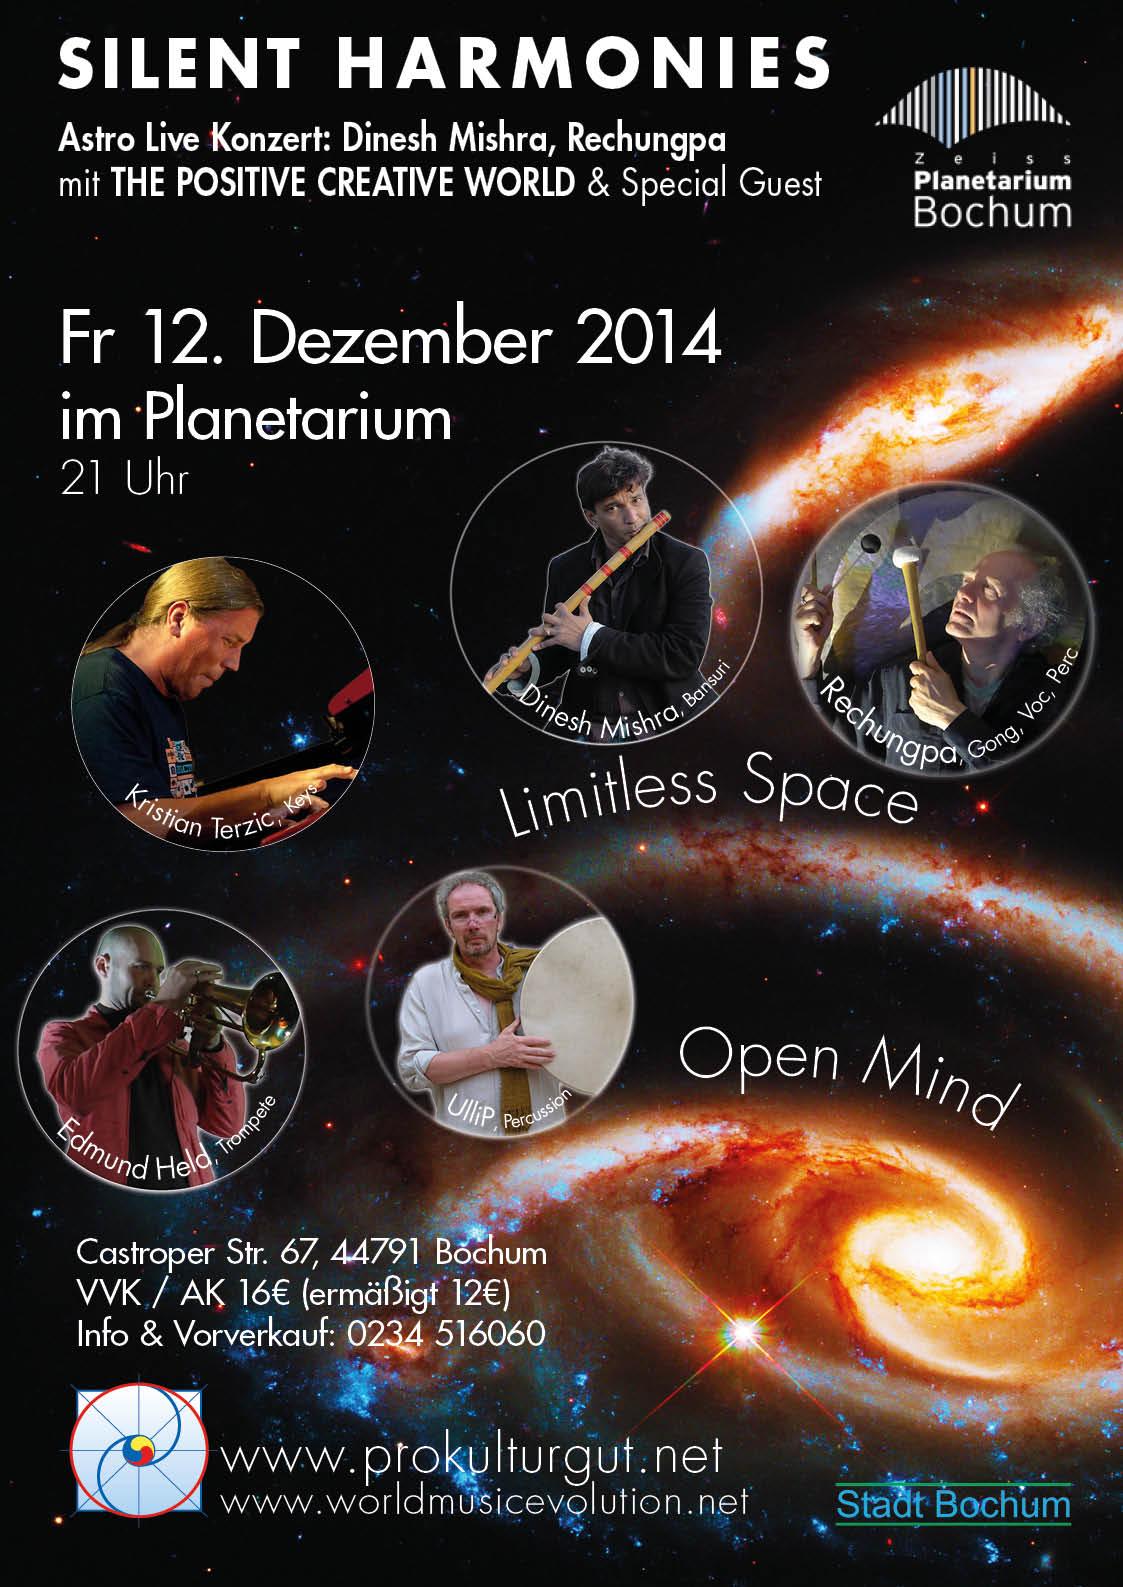 141212 Silent Harmonies im Planetarium BO neu Web